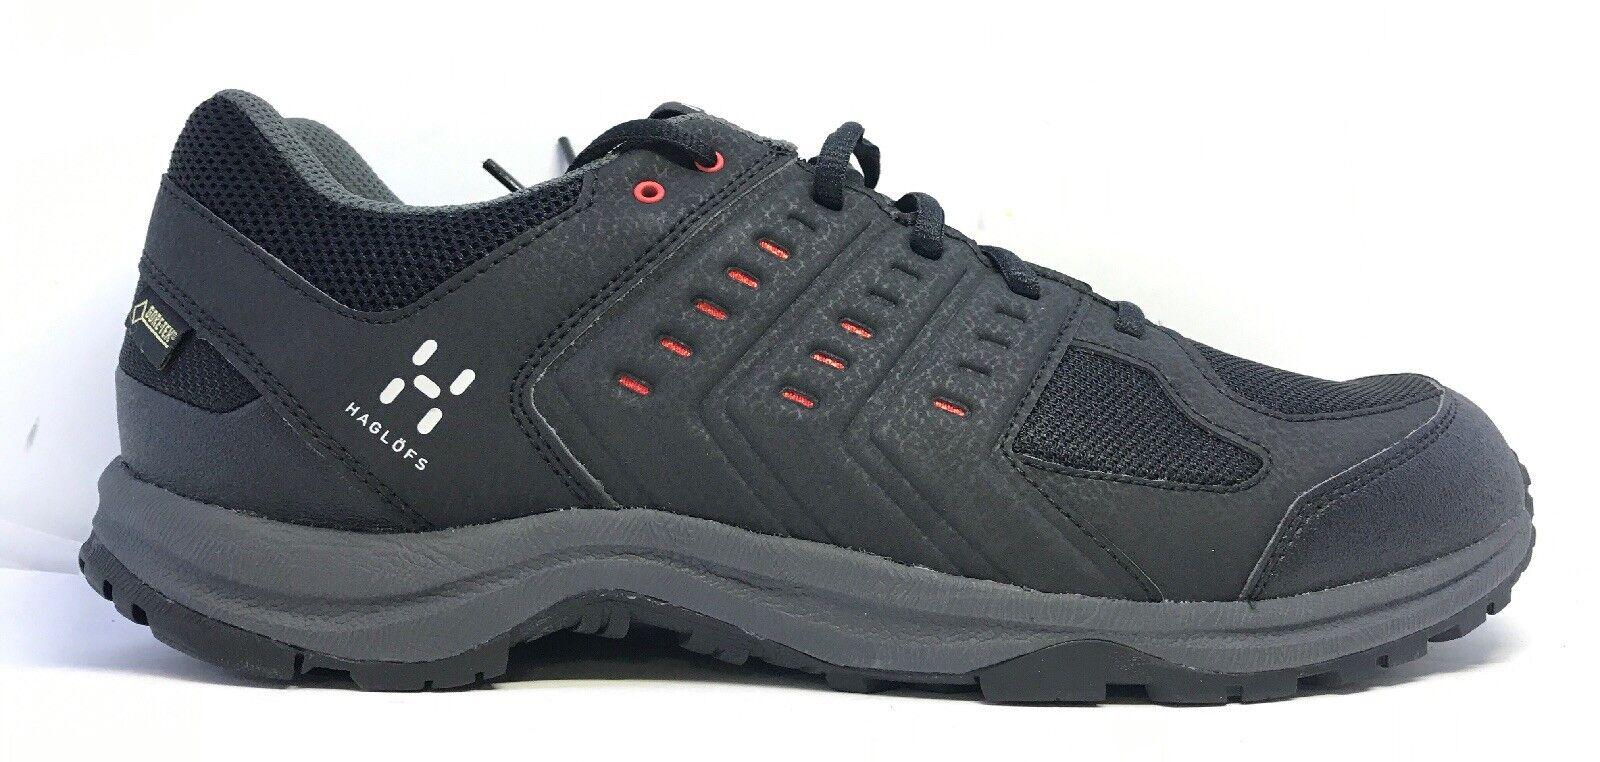 Haglofs Mens Motion Gt Black Lace Up Trainers Uk Size 10.5